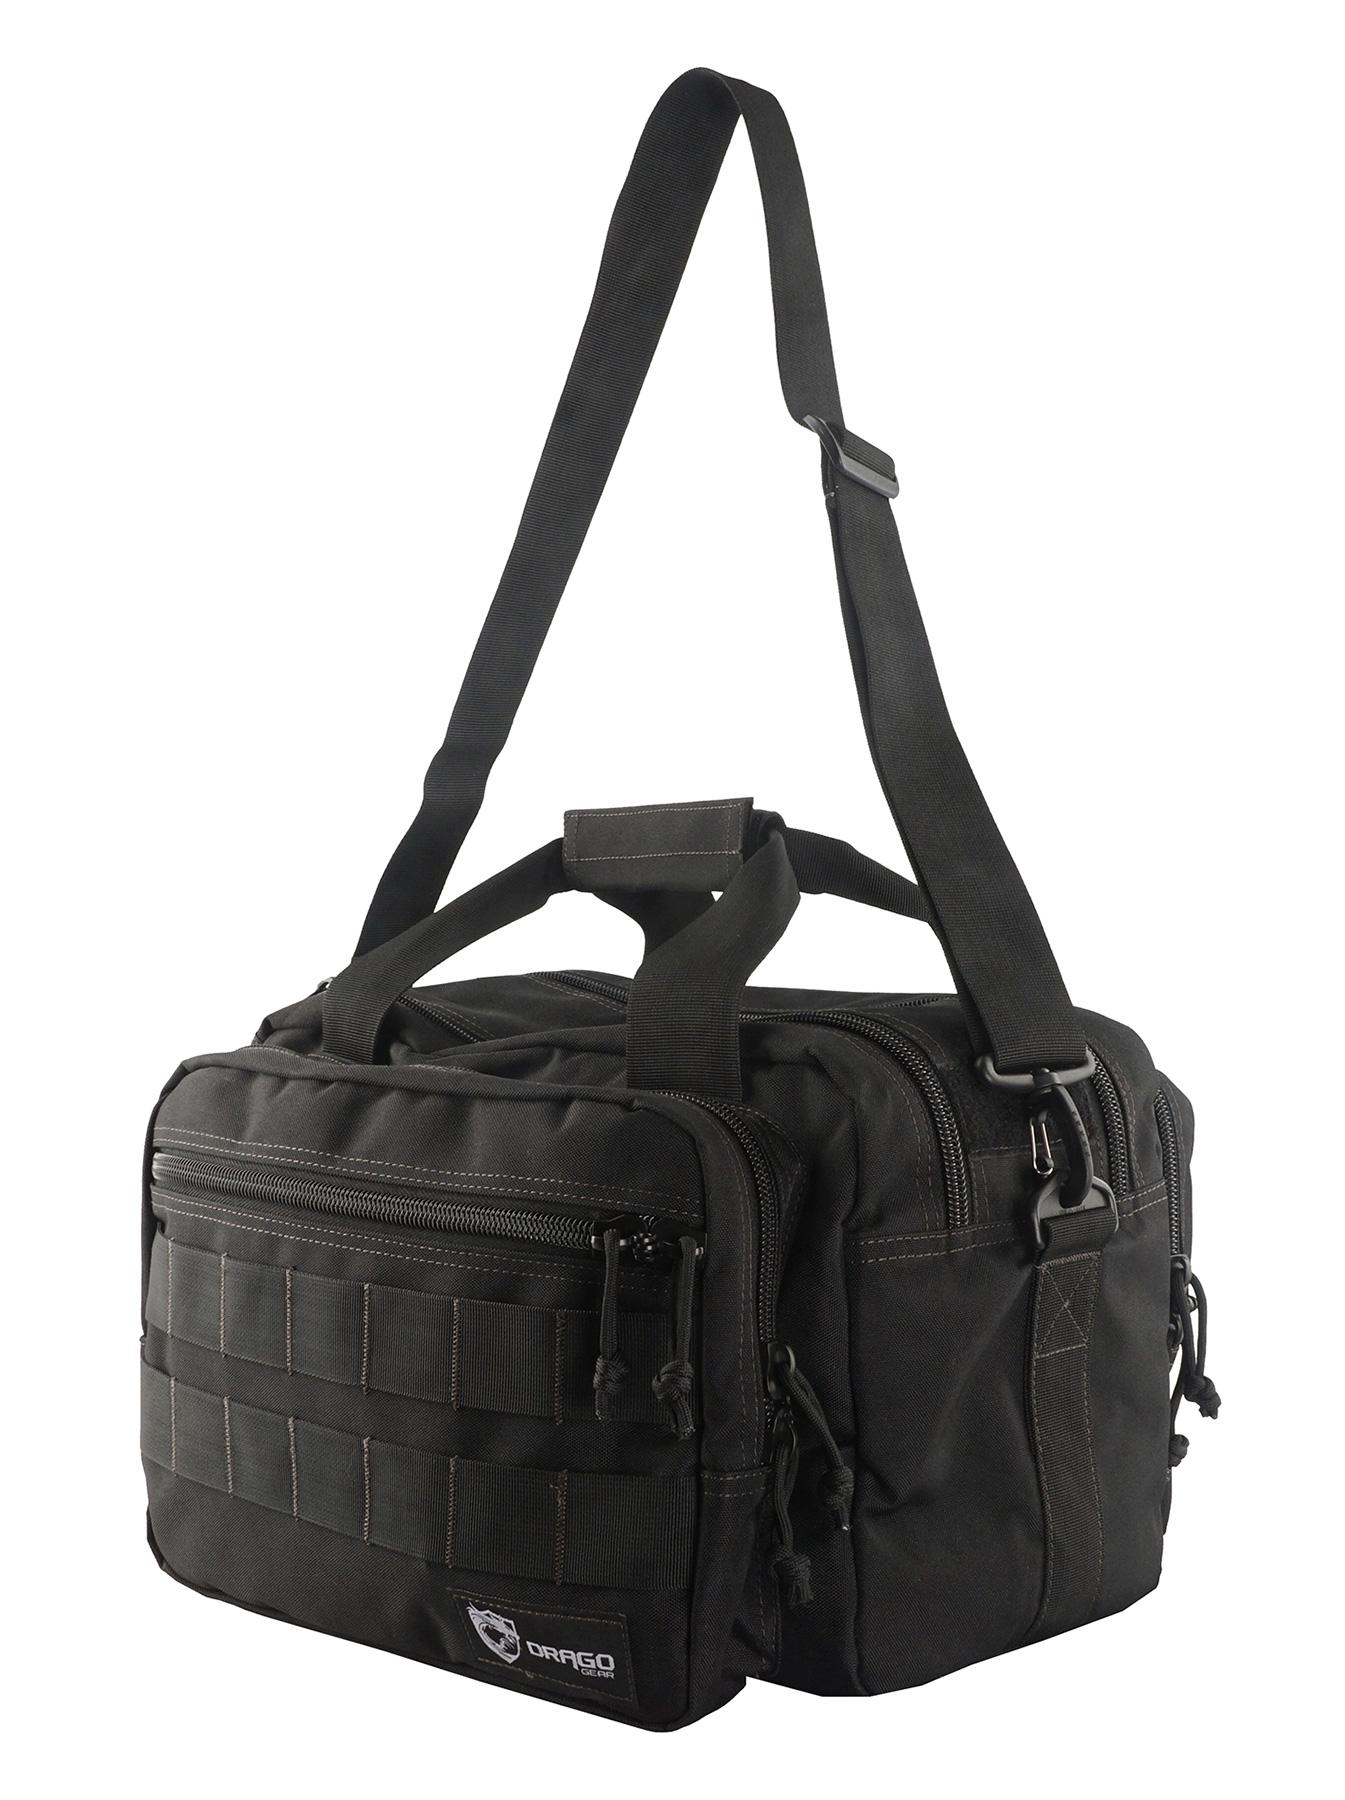 Pro Range Bag Drago Gear